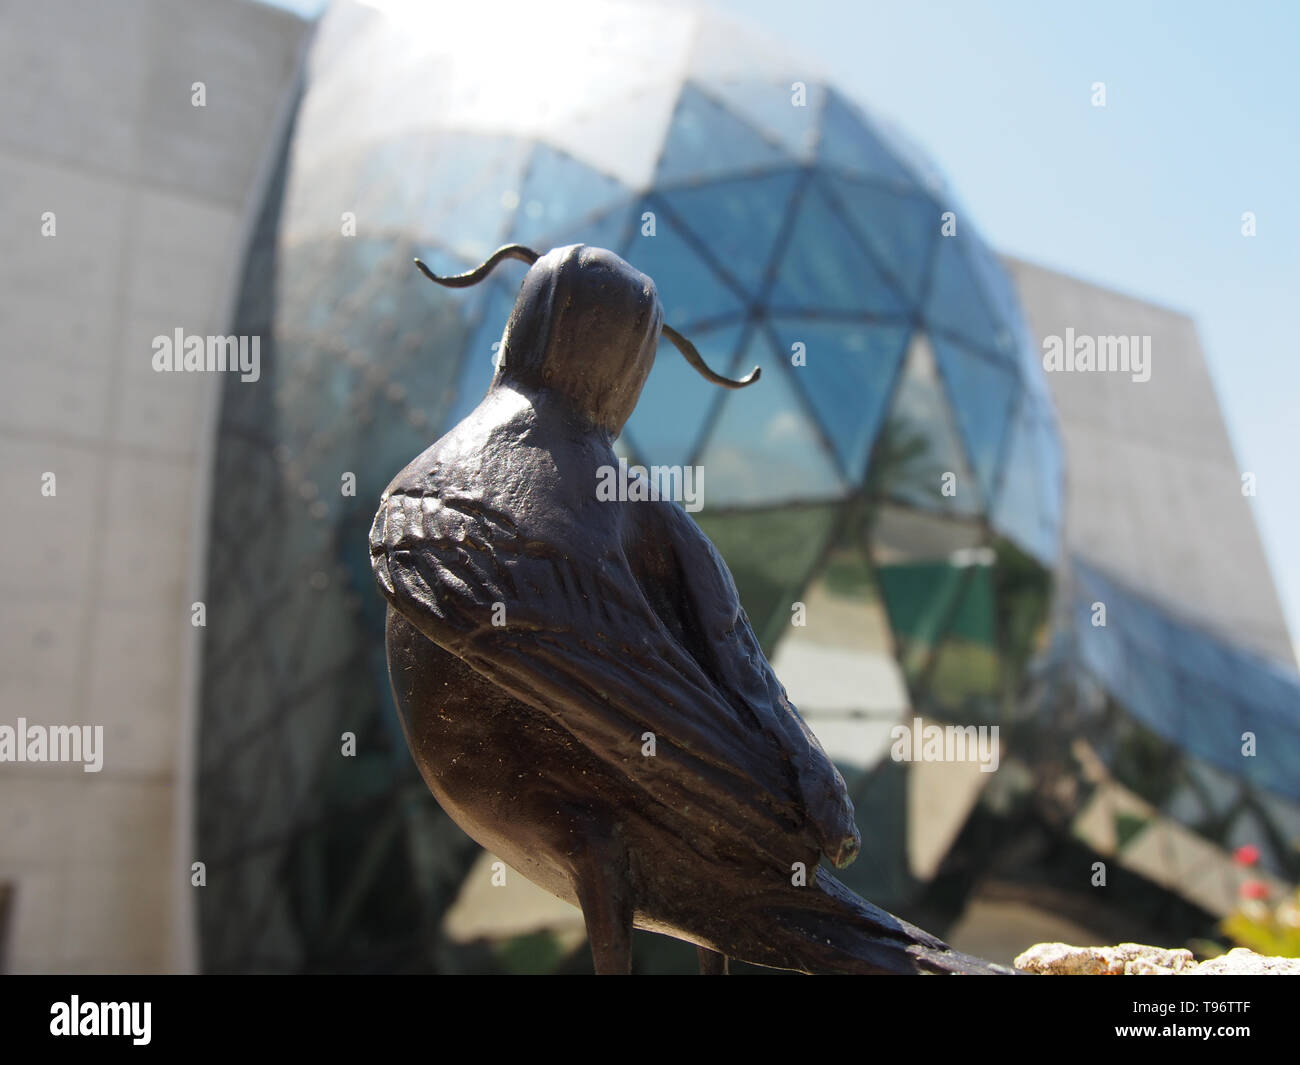 Mustachioed bronze bird sculpture in the Avant-garden at the Dali Museum, St. Petersburg, Florida, USA, May 8, 2019, © Katharine Andriotis - Stock Image